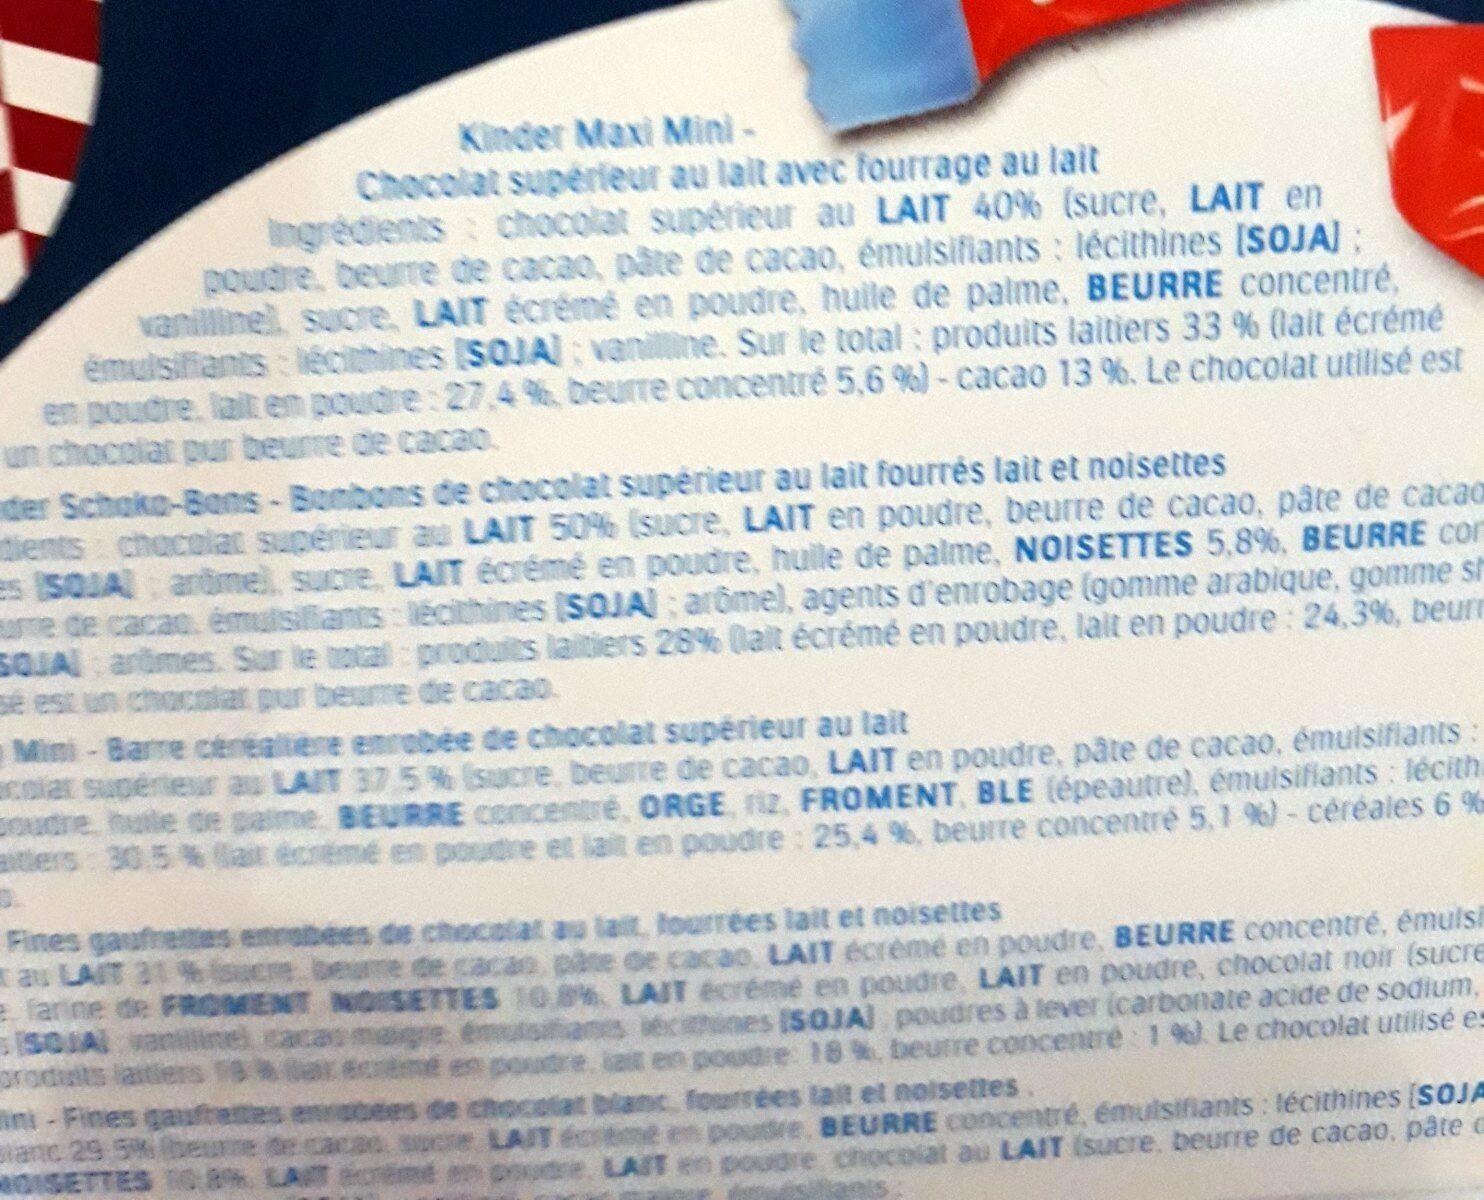 Happy moments minimix - Ingredients - fr